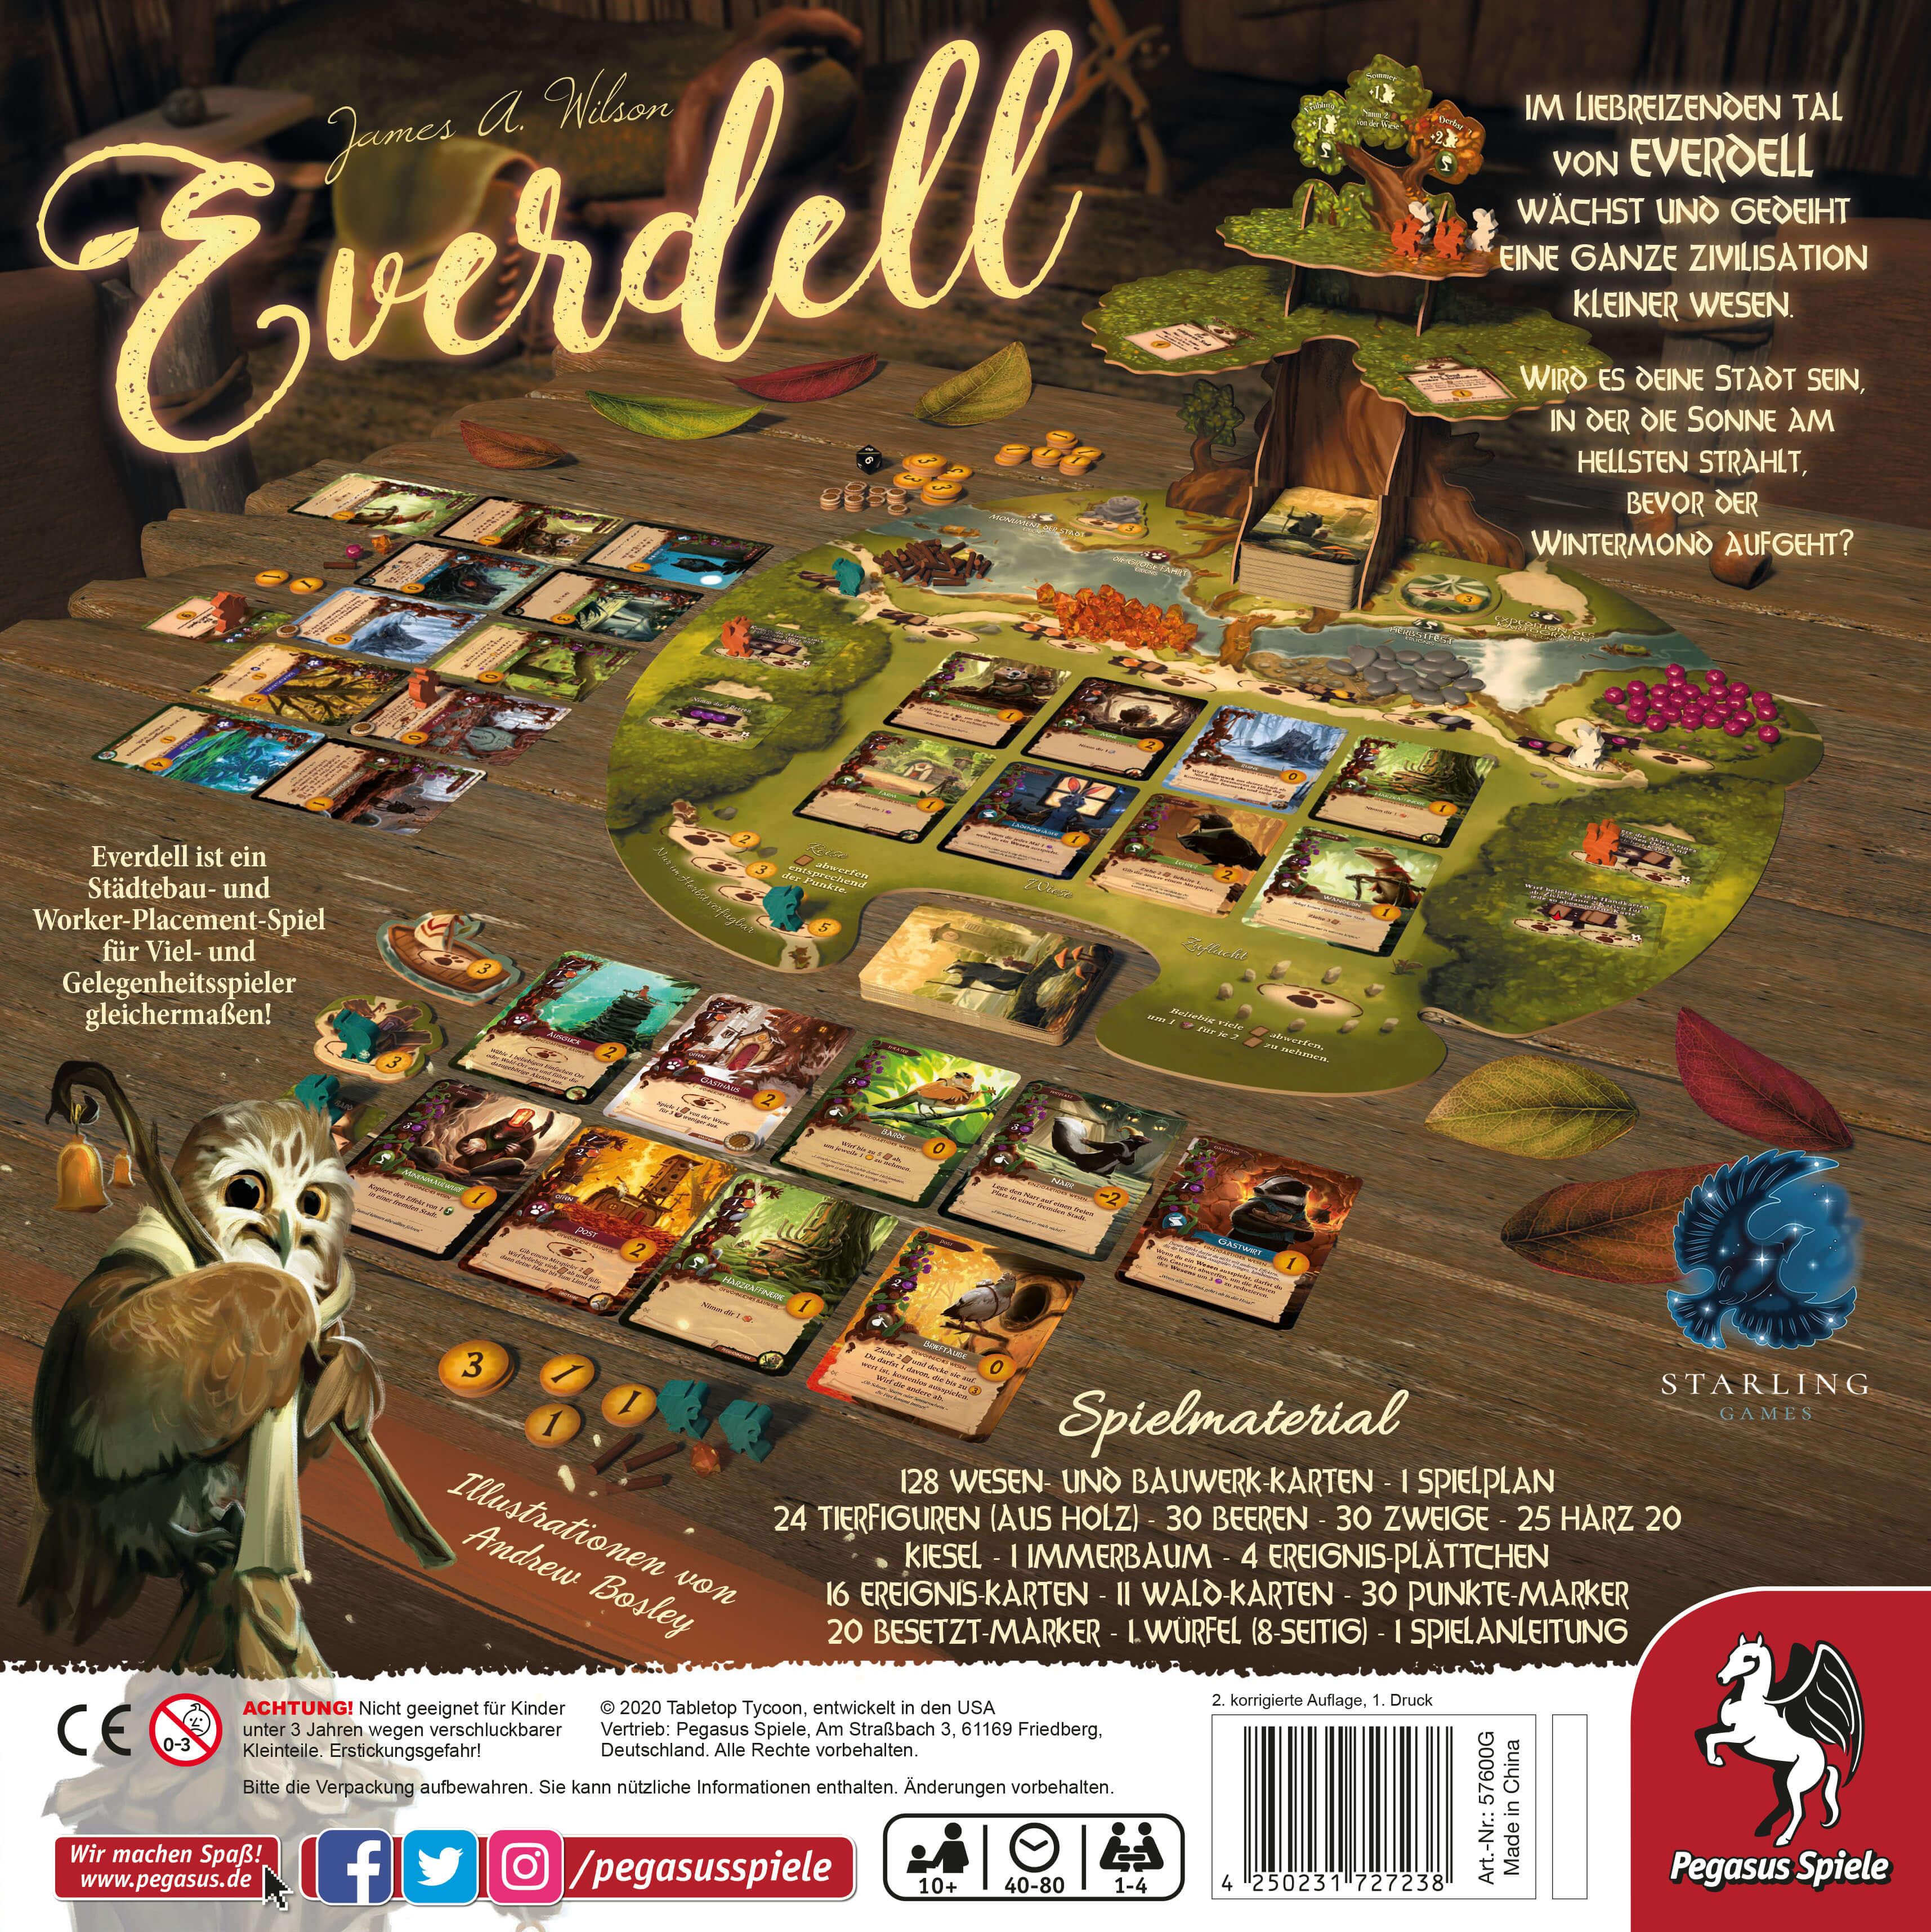 Schachtel Rückseite- Everdell